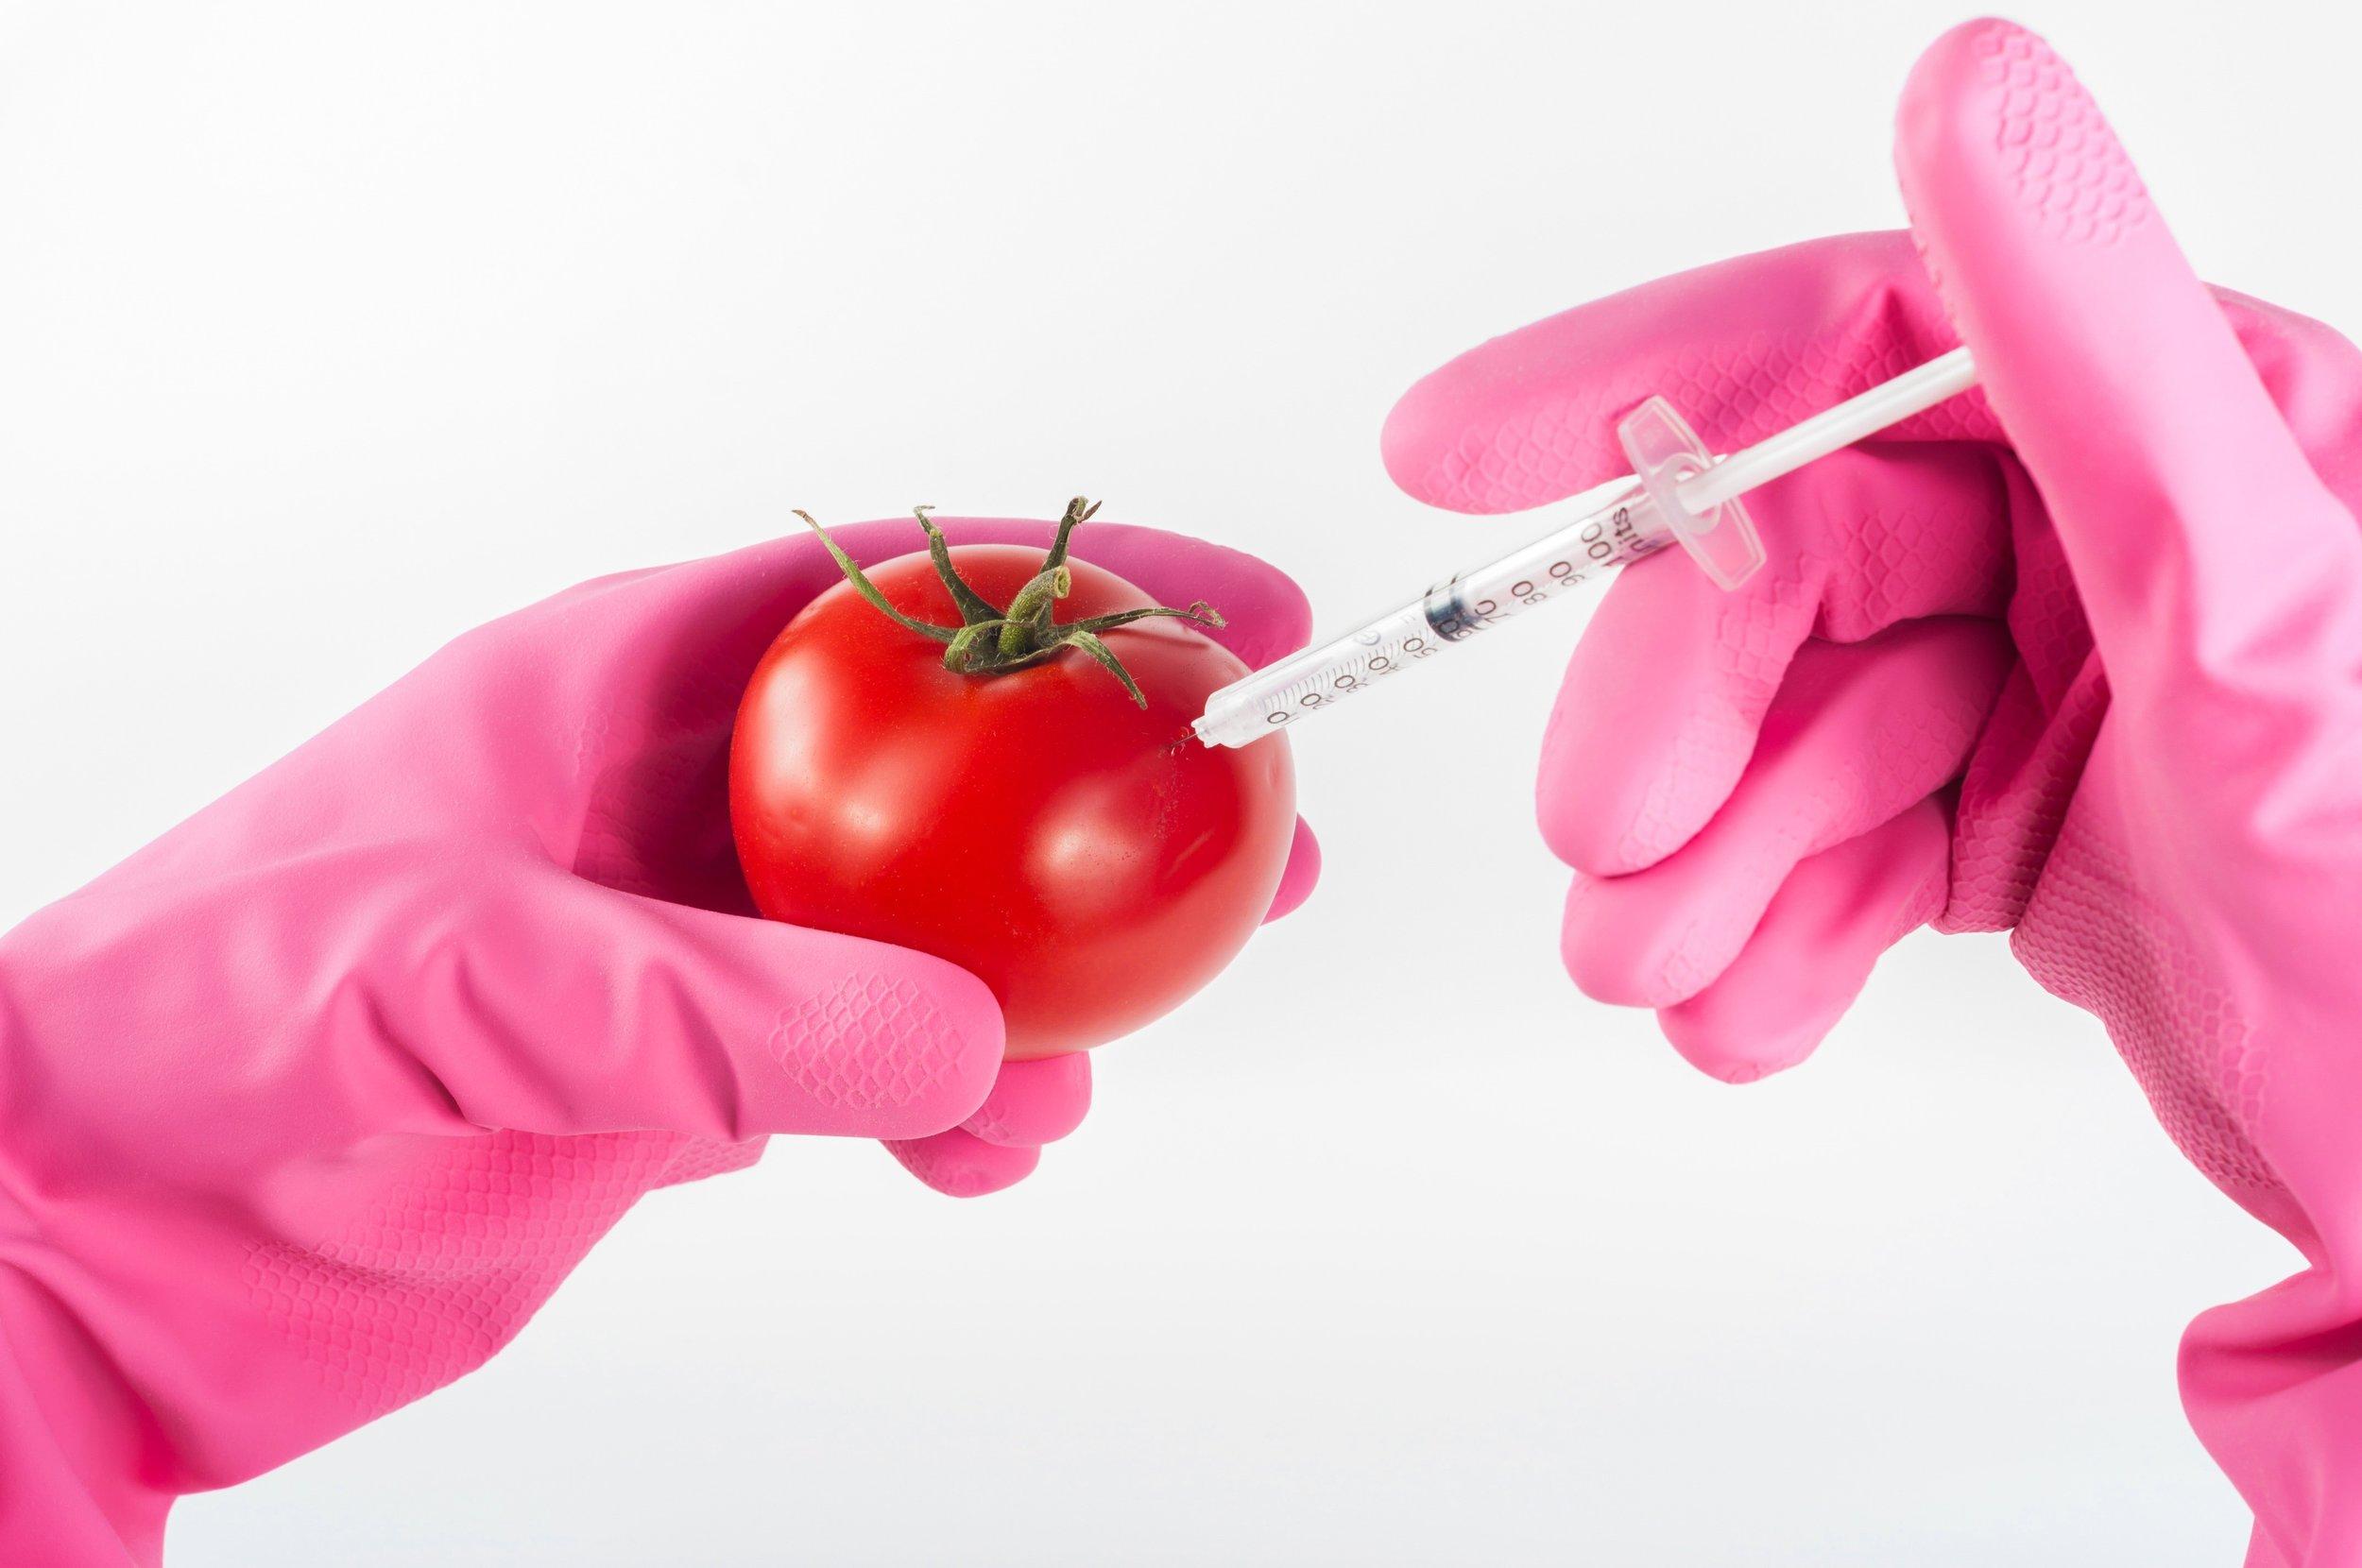 biotechnology-bright-chemical-207585.jpg